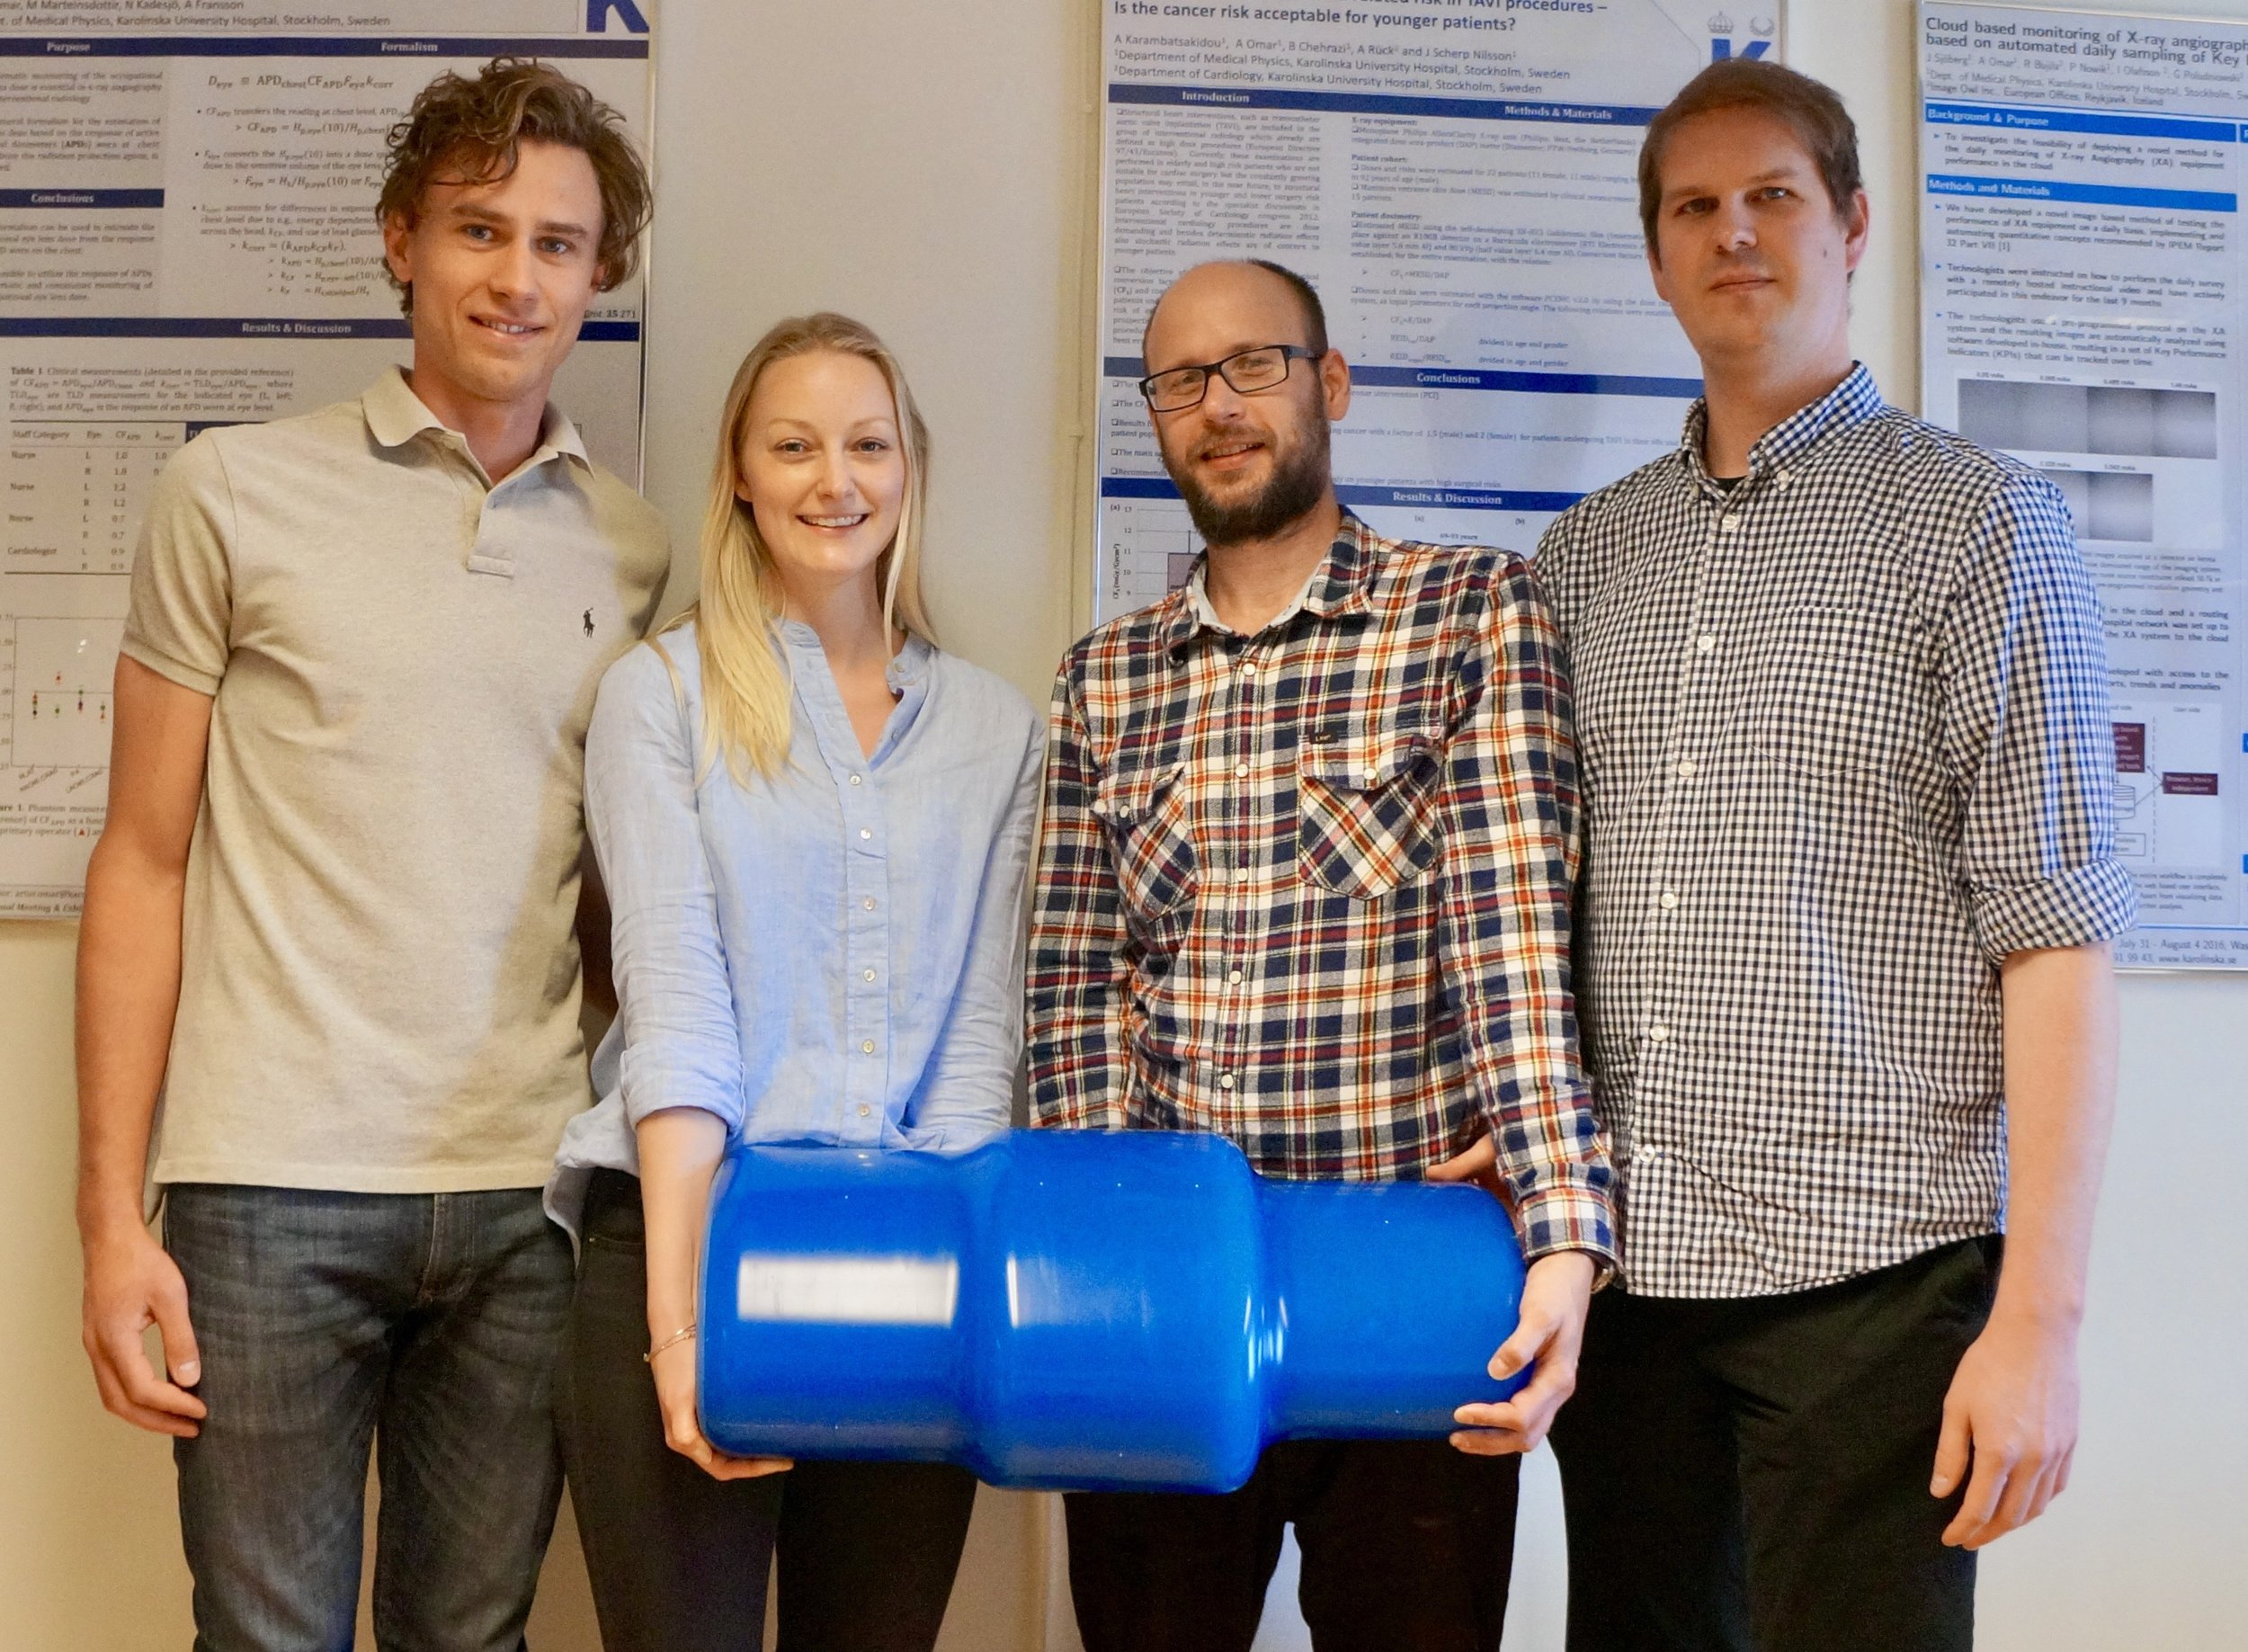 (from left) Patrik Nowik, Deborah Merzan, Gavin Poludniowski, and Robert Bujila with the Karolinska ATCM Phantom